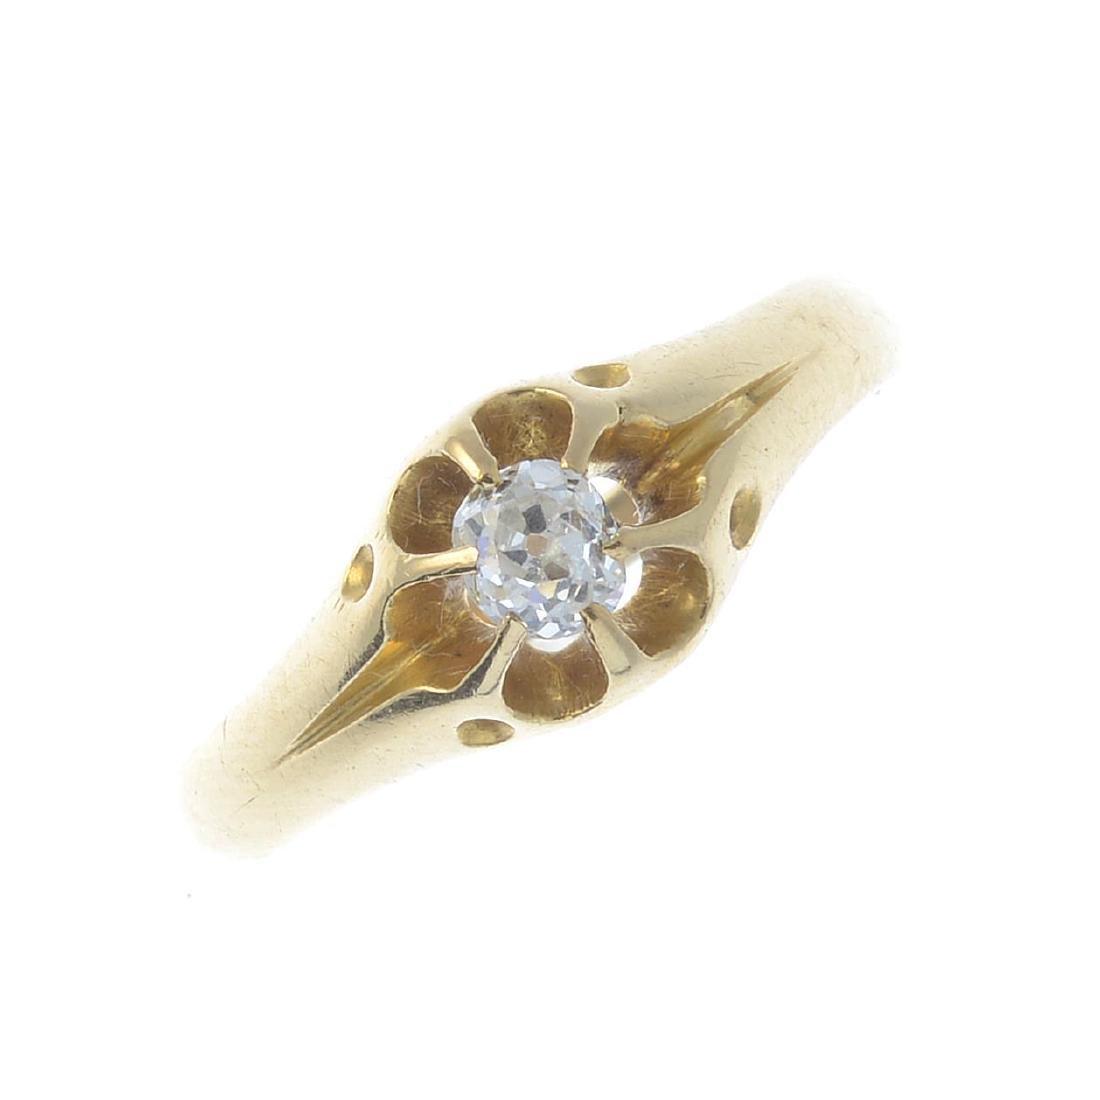 A diamond single-stone ring. The old-cut diamond, with